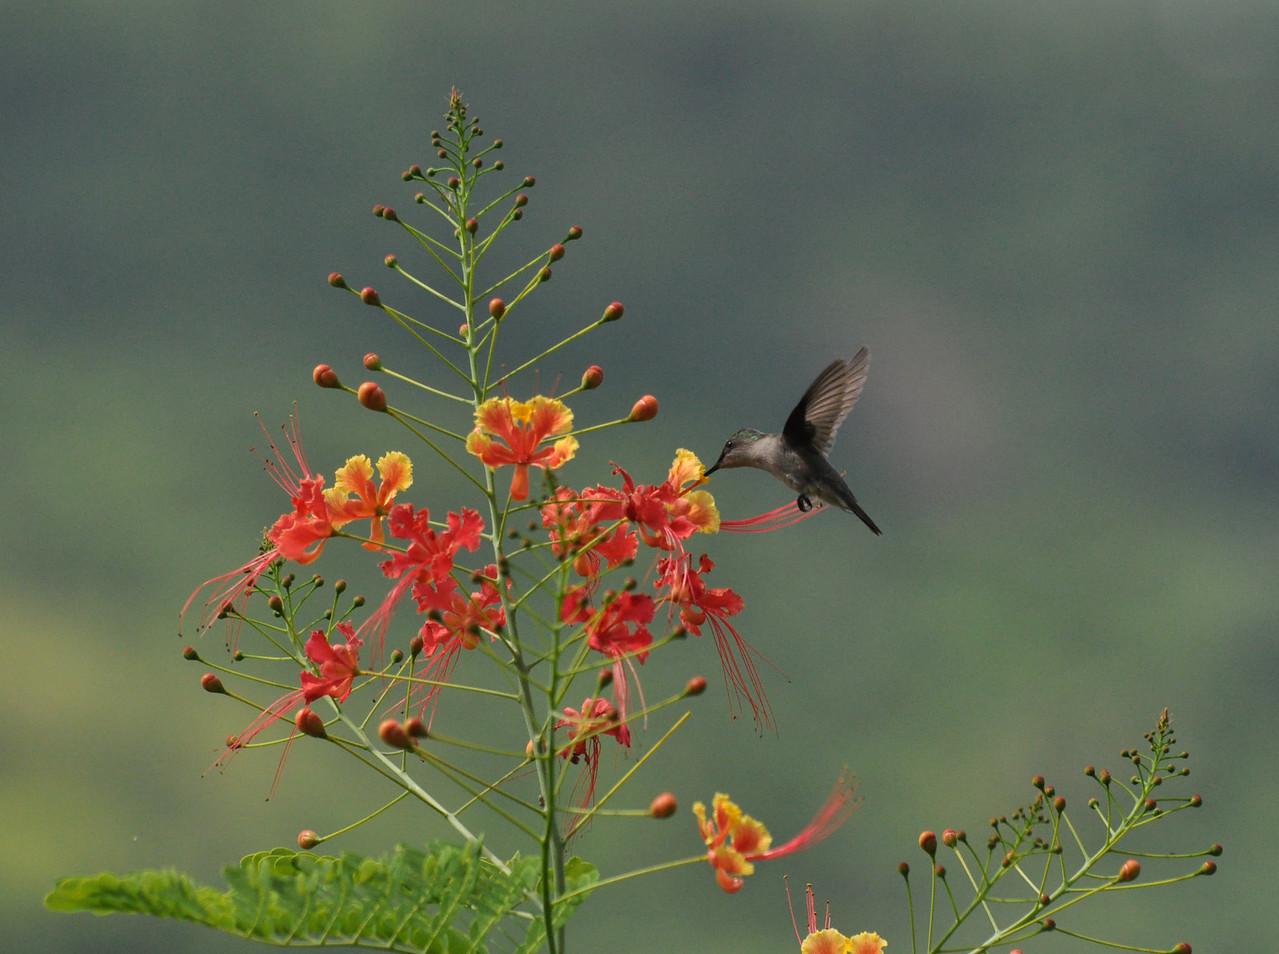 Antillean Crested Hummingbird Barbados Flower Forest August 2011